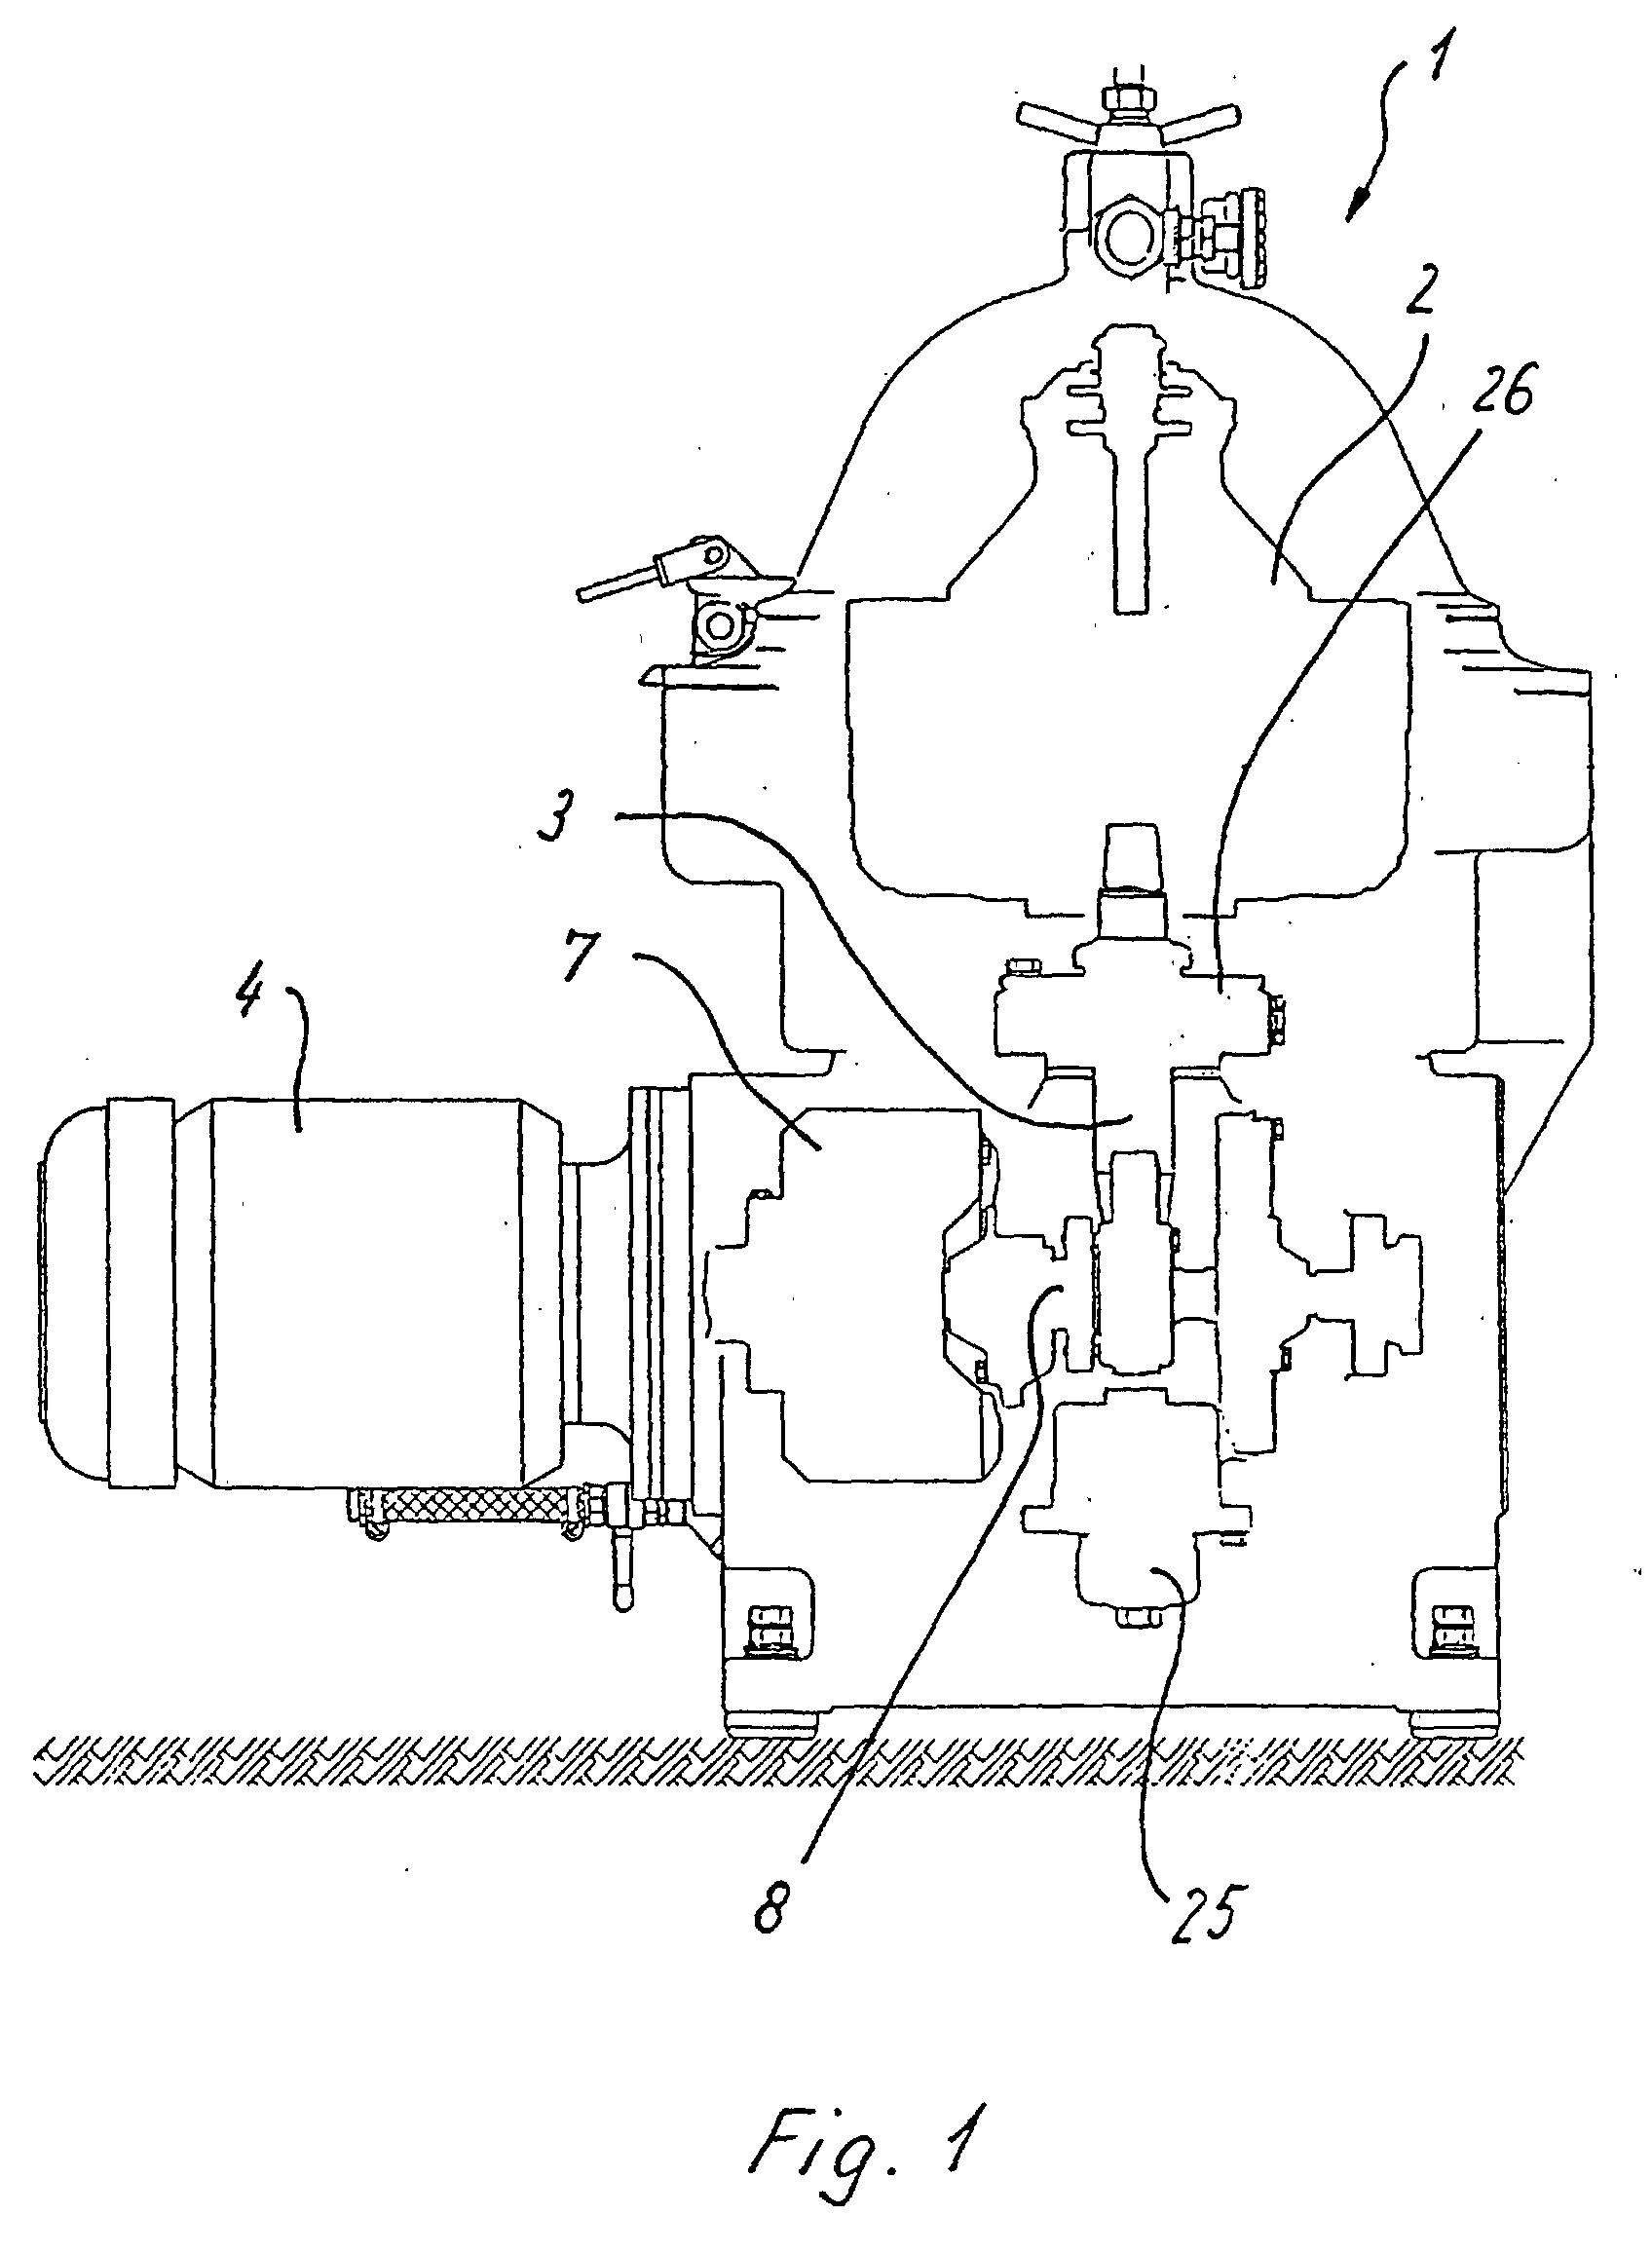 1980 Kawasaki Kz250 Wiring Diagram Honda Rc51 Wiring